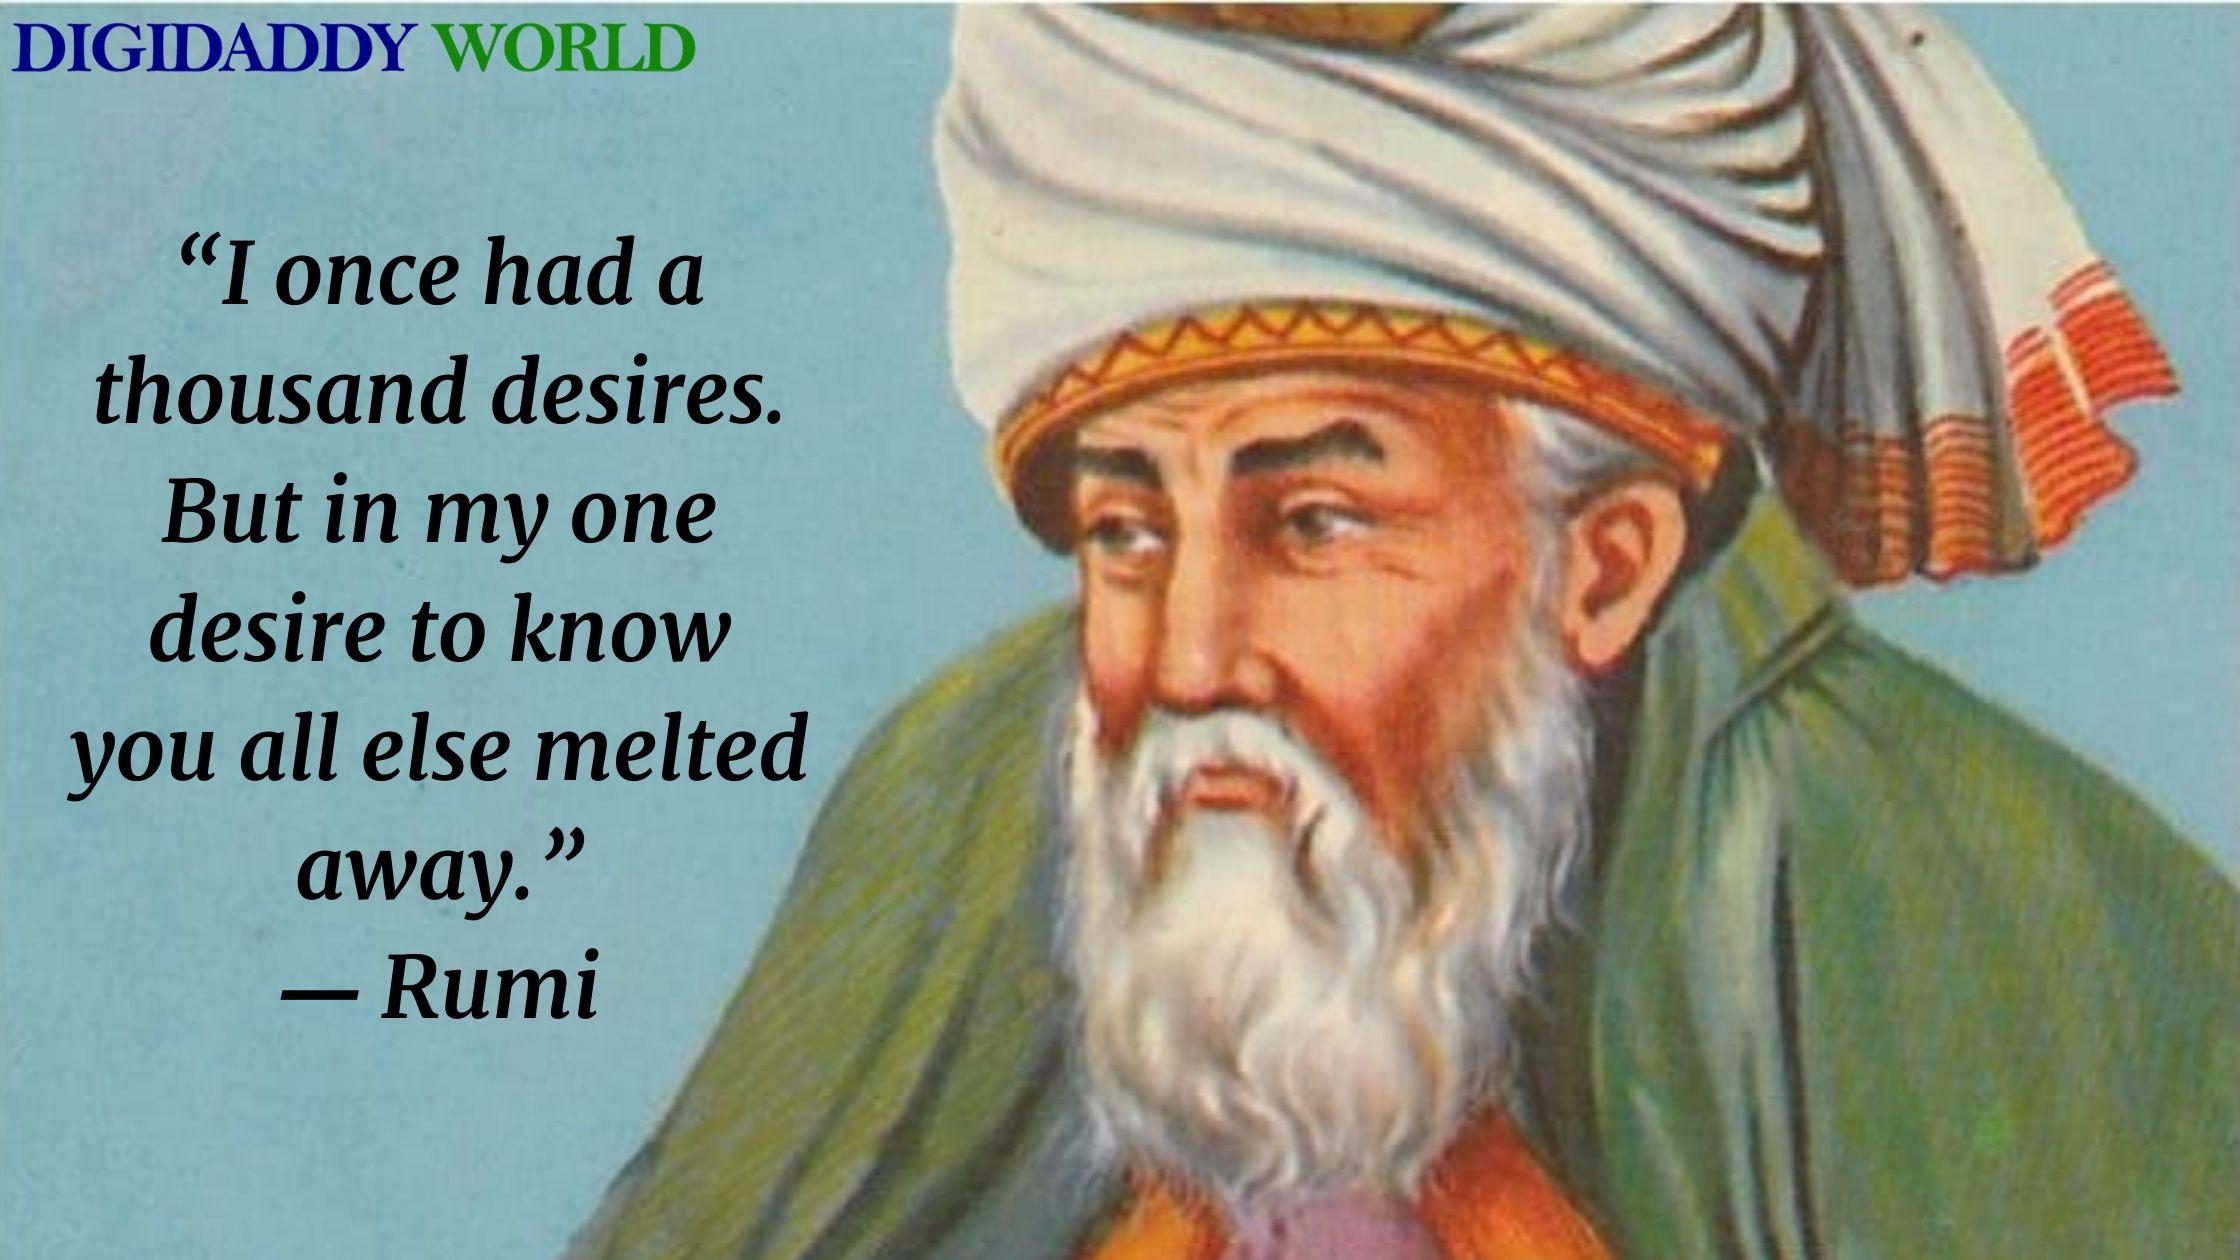 Sufi Poet Rumi Quotes on Life, Love, Nature, Death